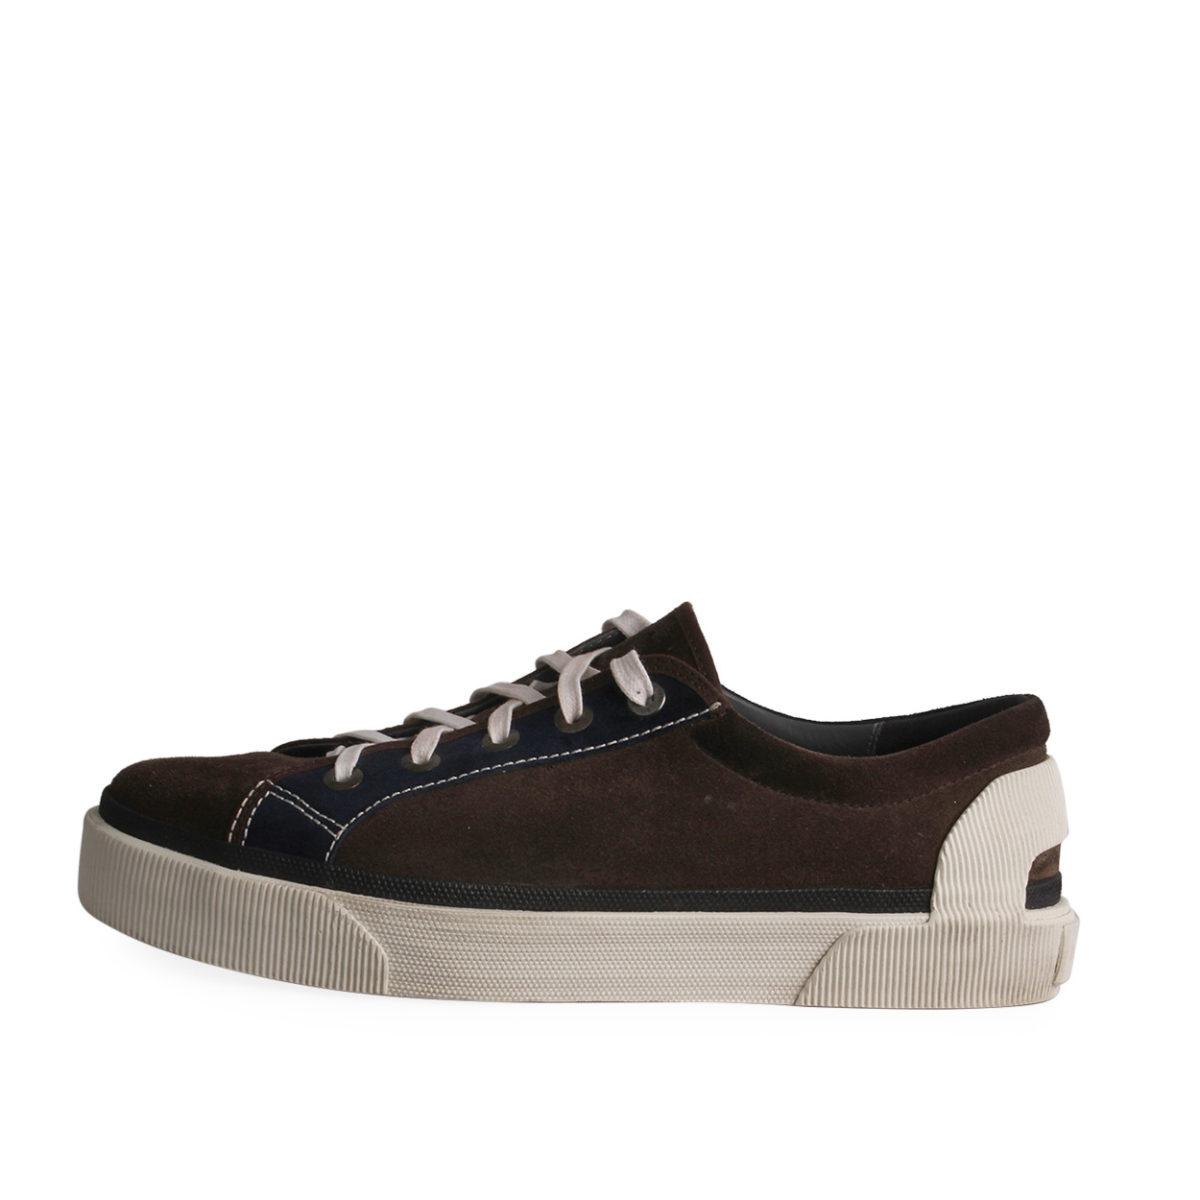 chaussures de sport 9ebf6 3ec7d LANVIN Suede Basket Oxford Sneakers Bicolor - S: 46 (11)